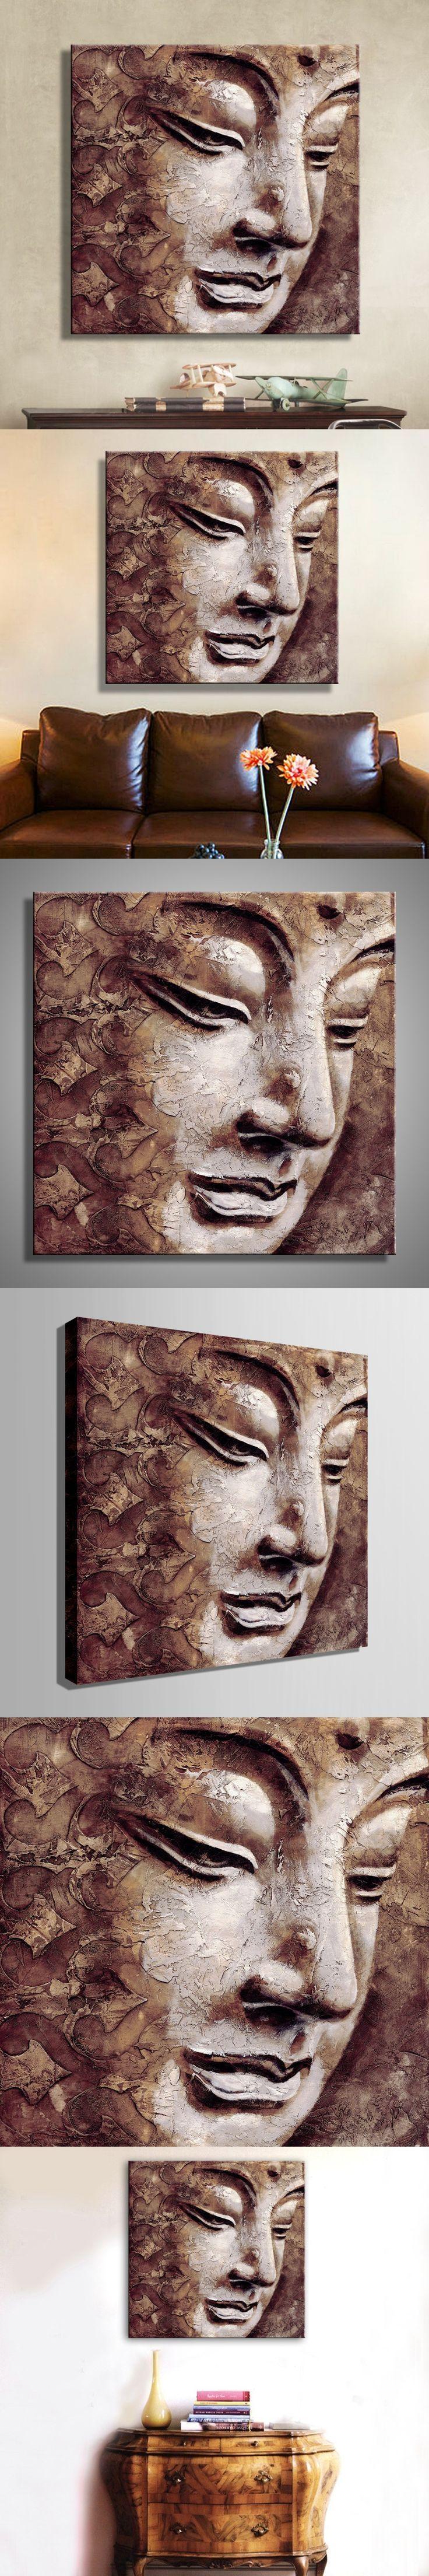 Best 25+ Buddha Wall Art Ideas On Pinterest | Buddha Art, Buddha Inside Buddha Wooden Wall Art (View 20 of 20)